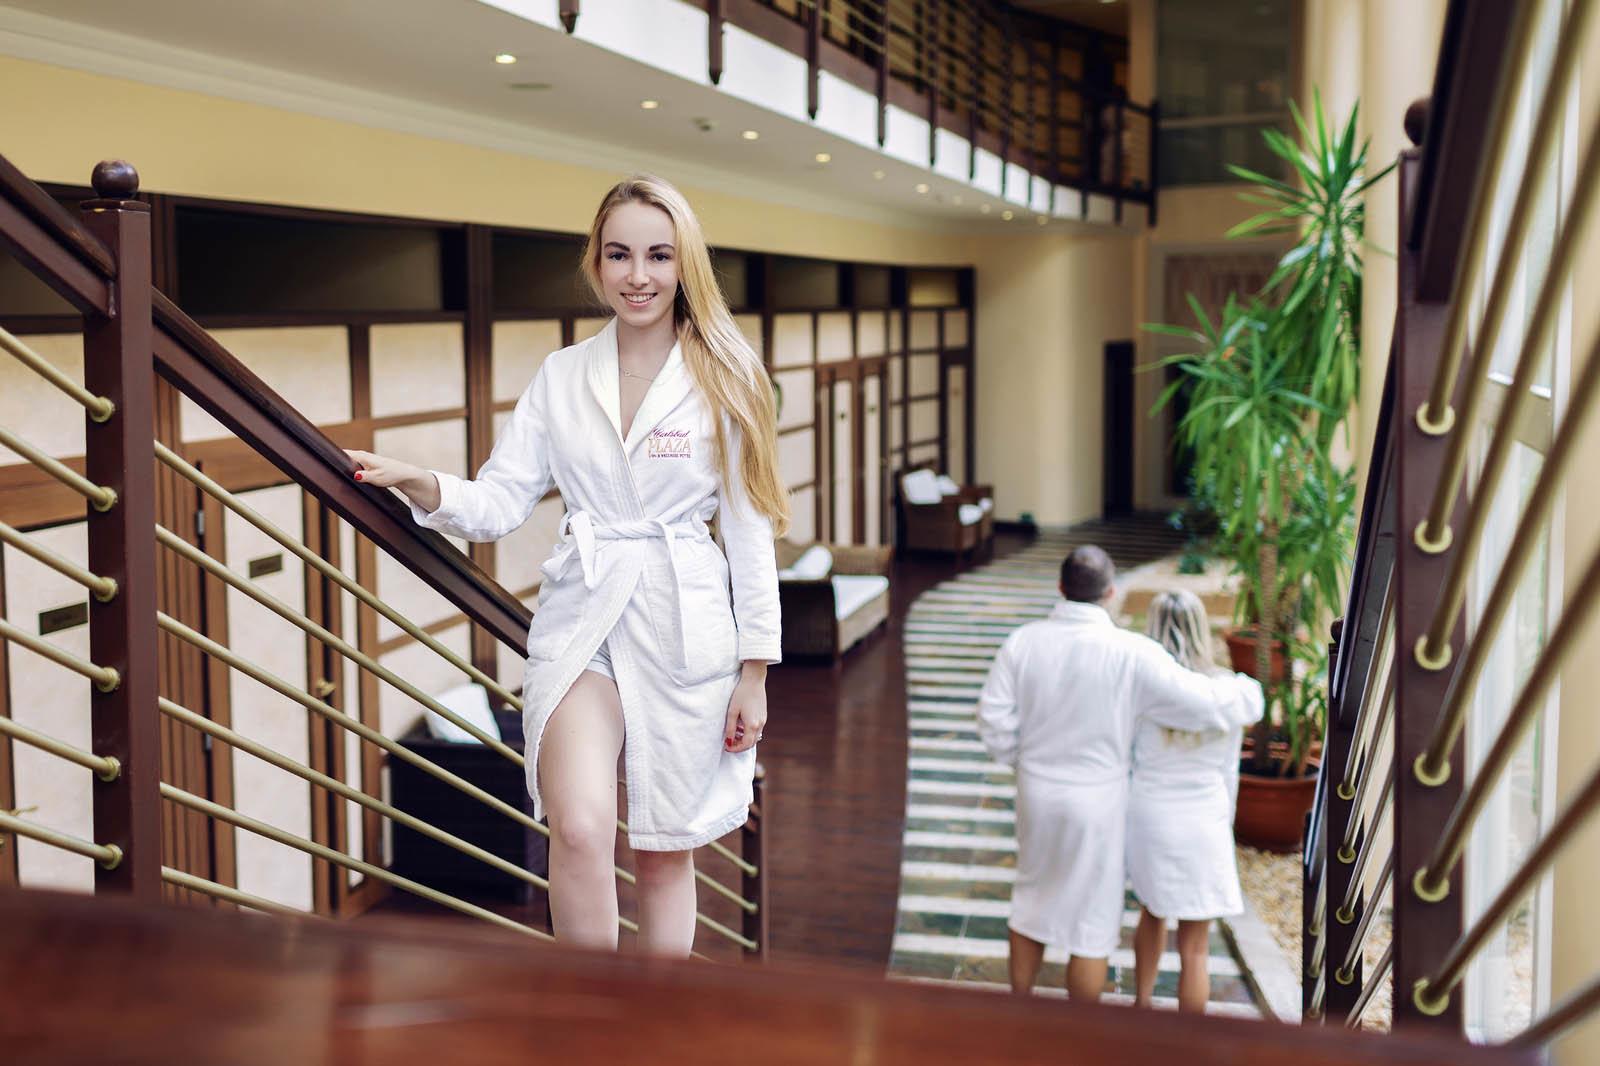 Medical Spa Gallery in Karlovy Vary | Carlsbad Plaza Hotel